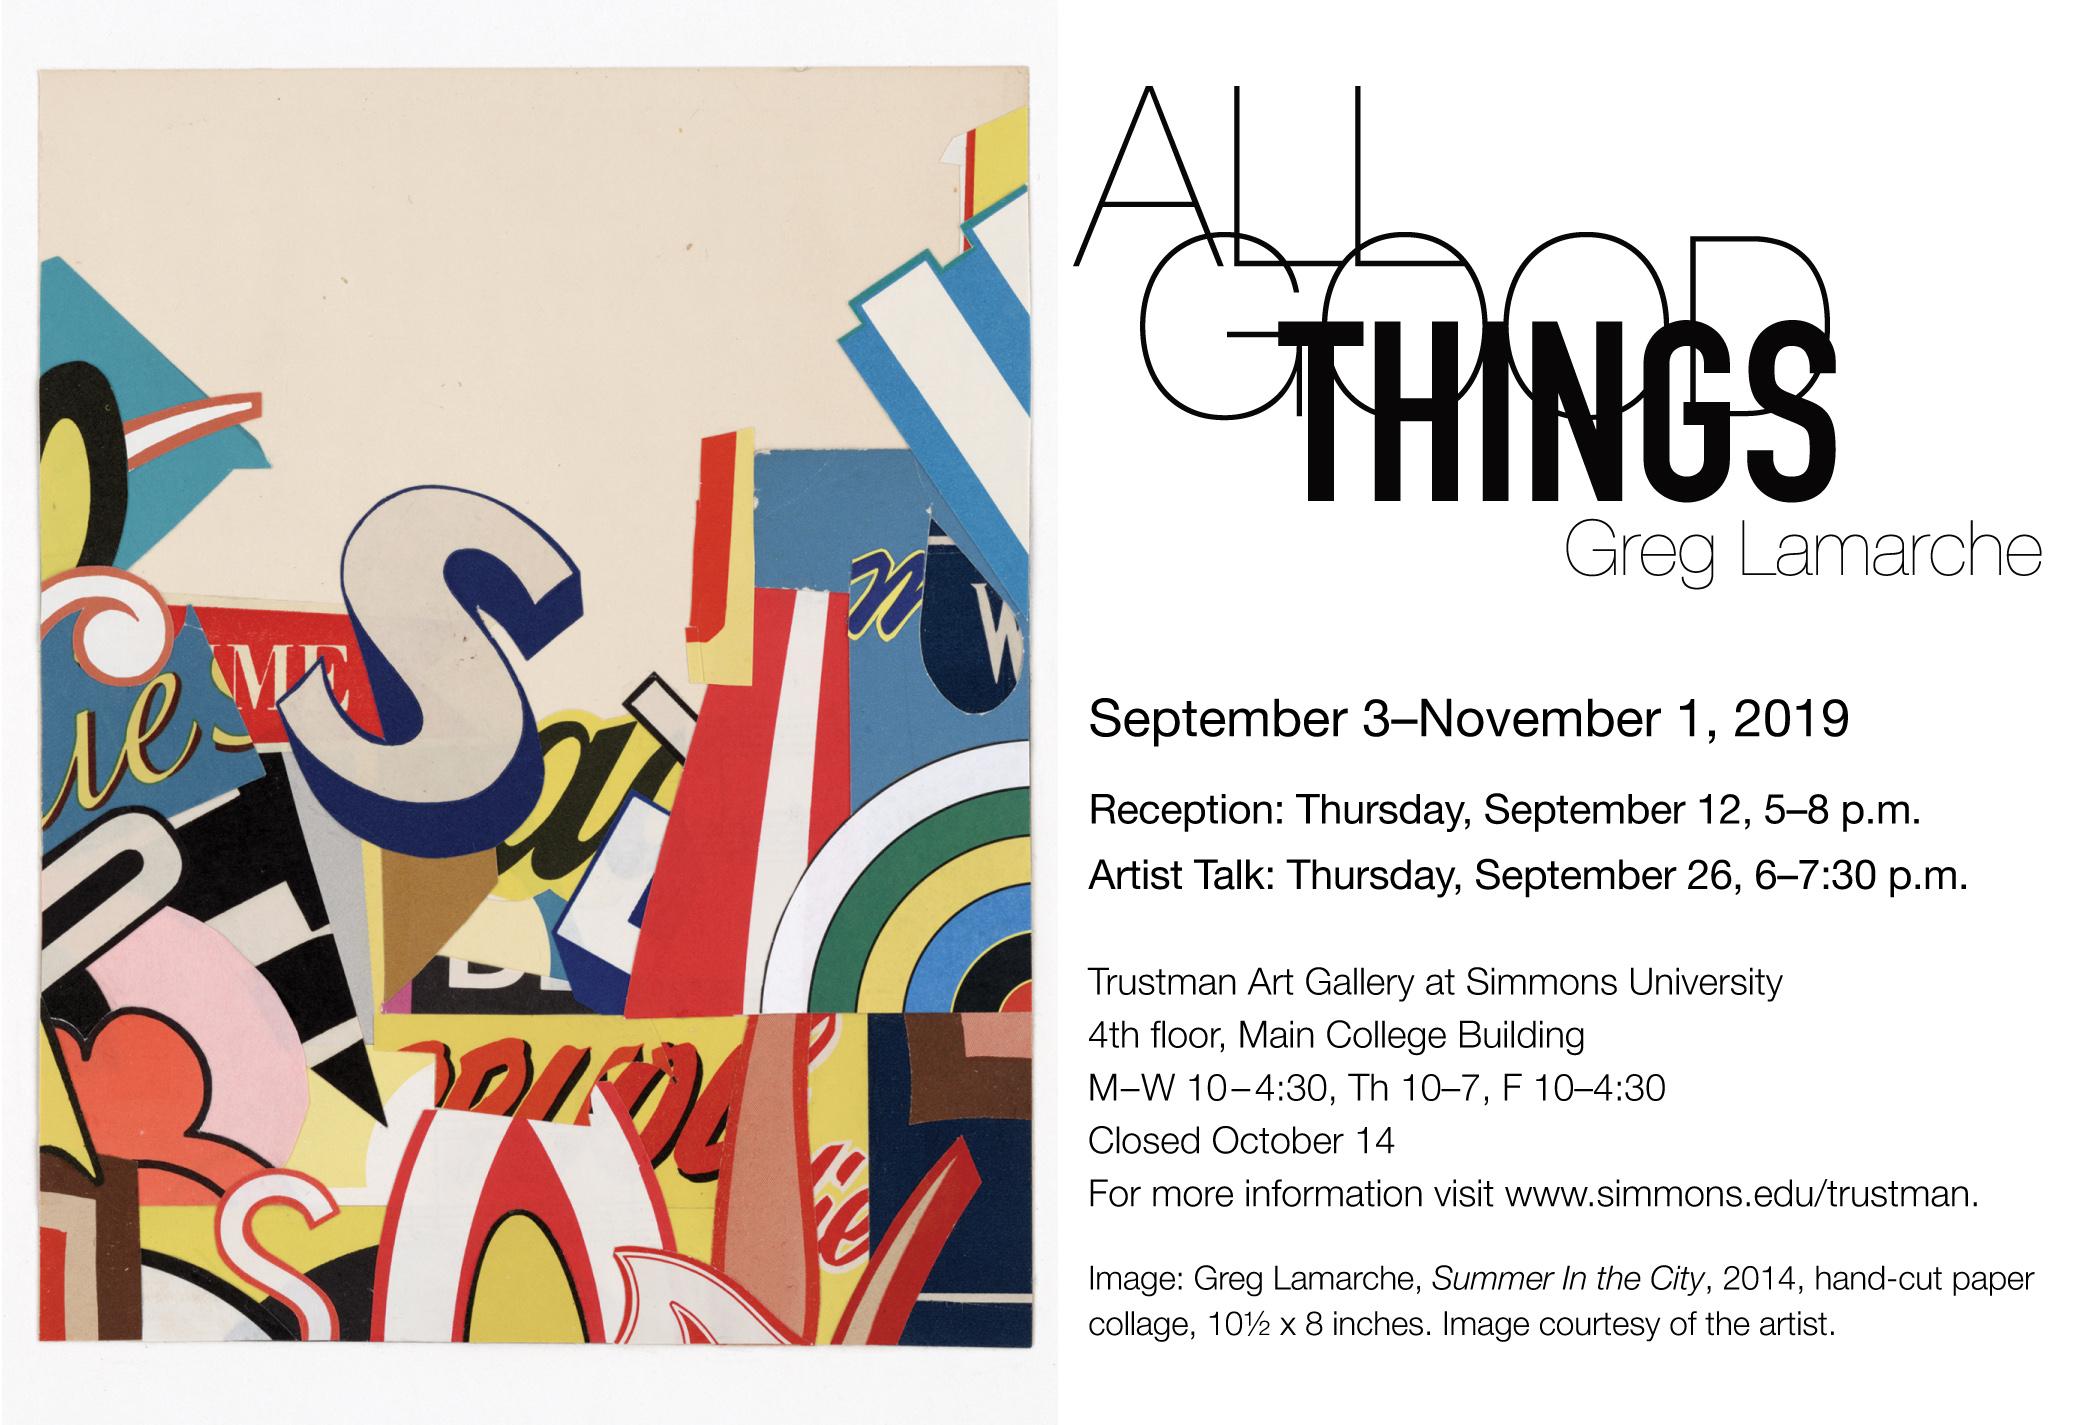 Greg Lamarche at Trustman Art Gallery at Simmons University